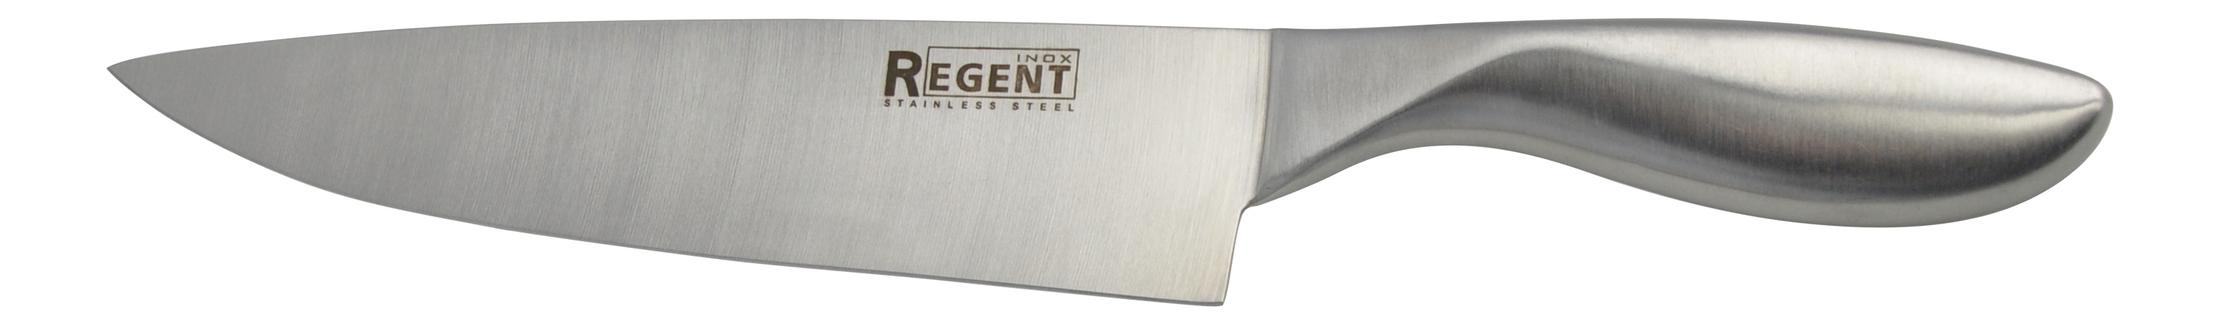 Нож кухонный REGENT inox 93 HA